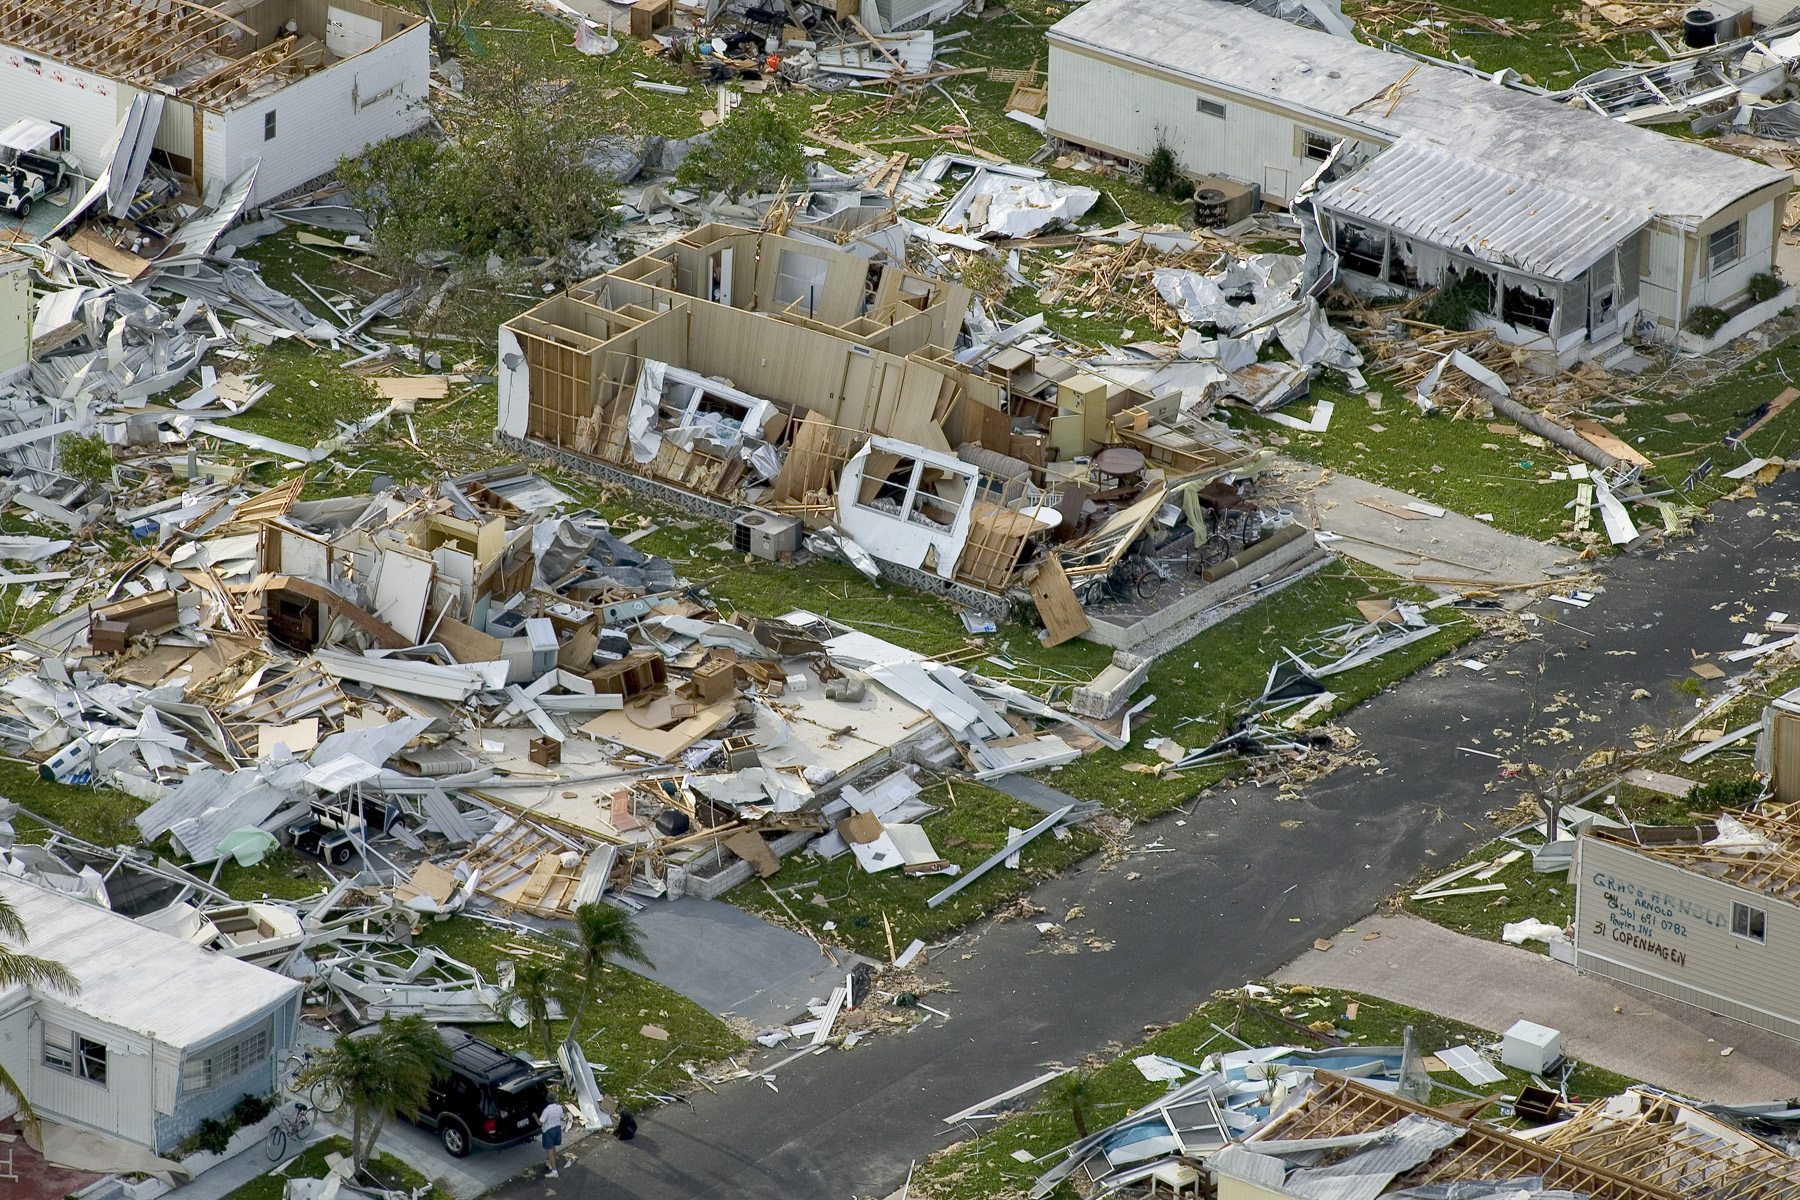 Effects of Hurricane